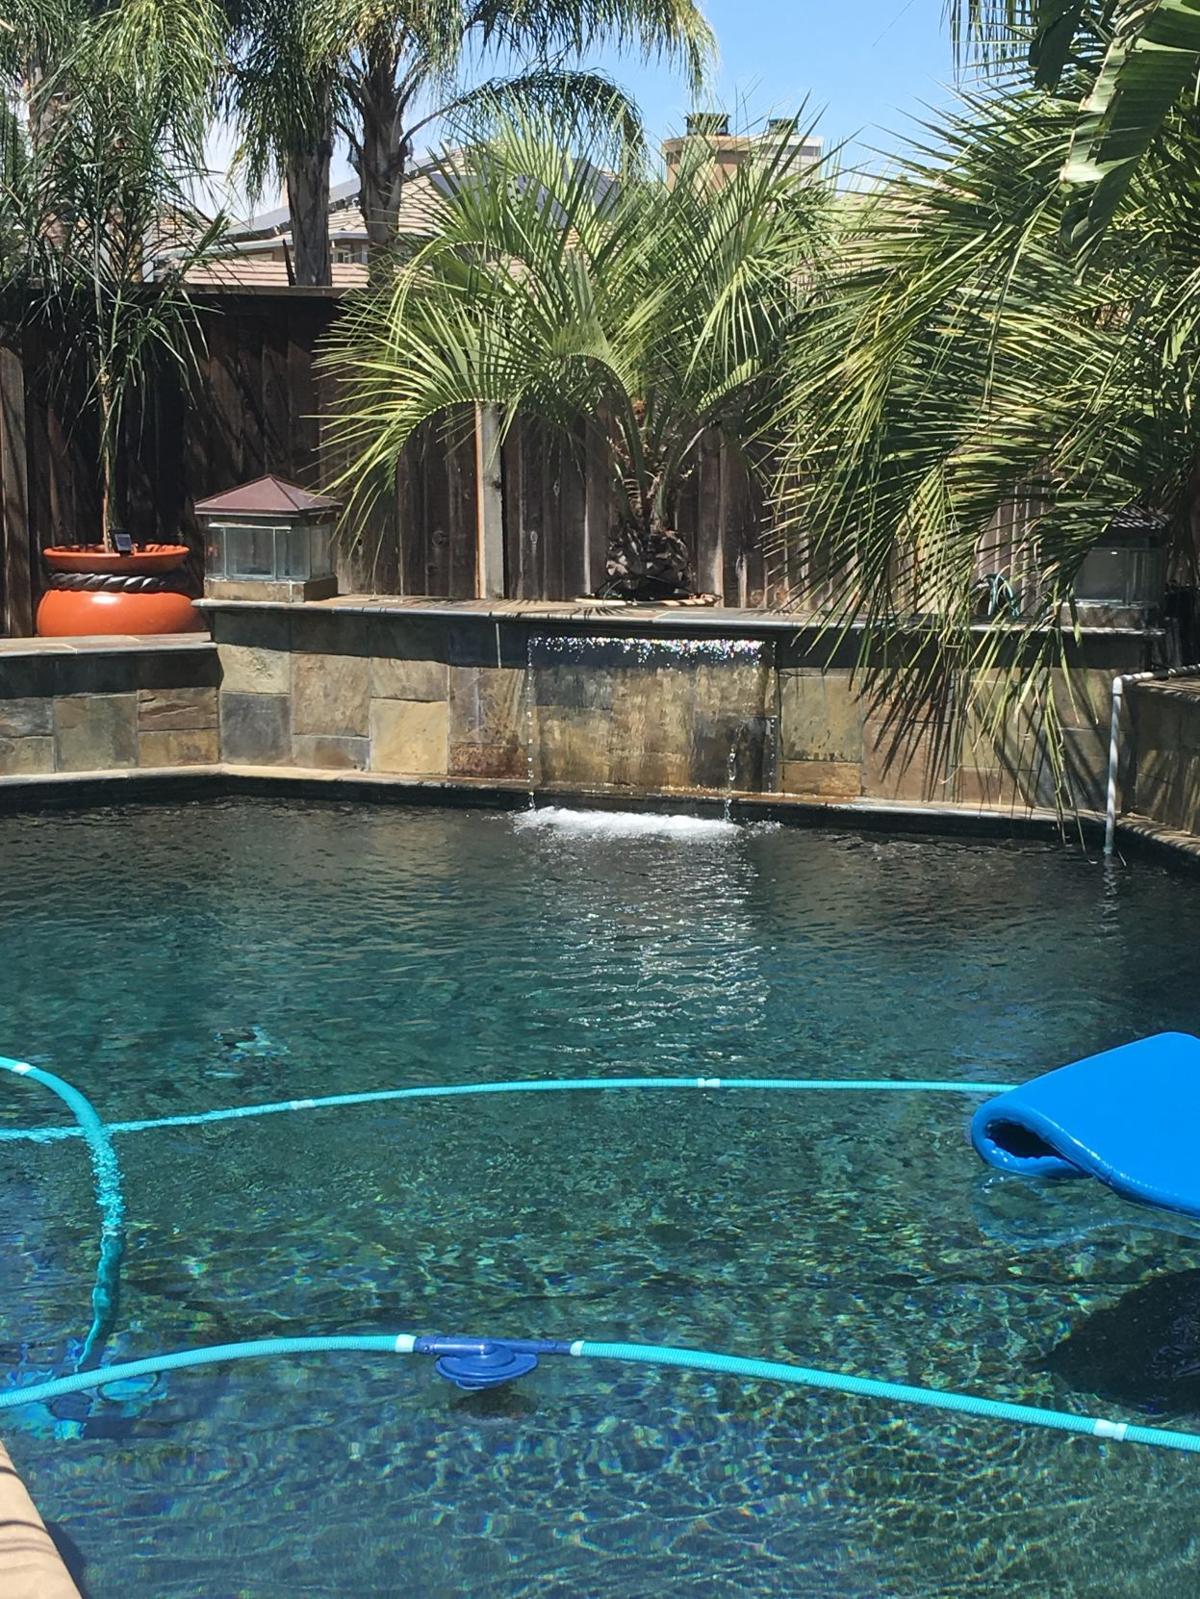 Atlantis Pool Service Pool Repairs Pool Cleanings